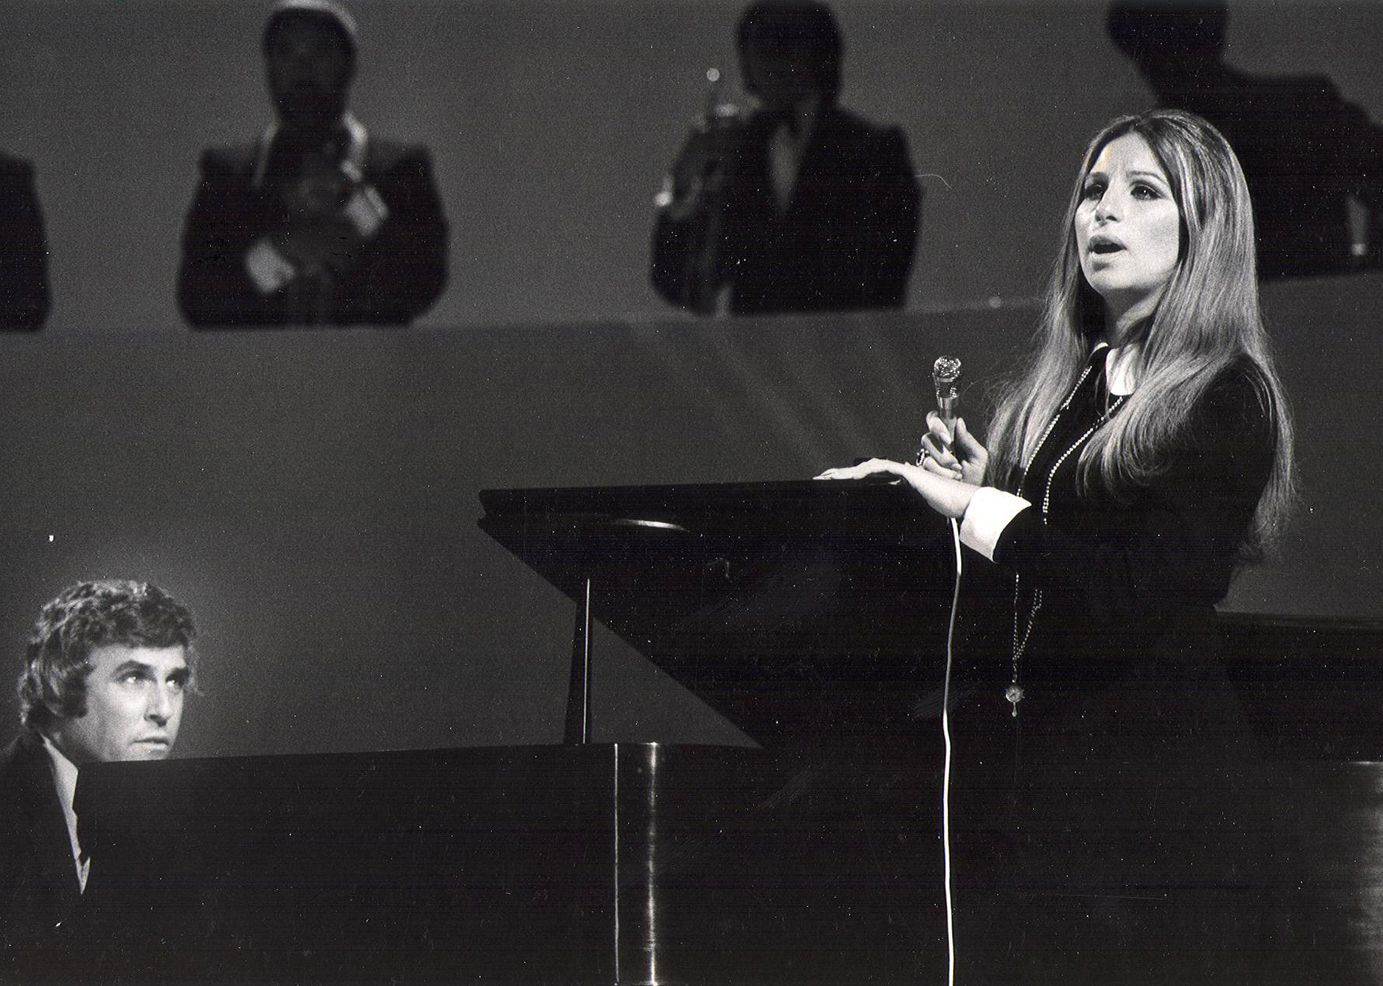 Barbra Streisand The Way We Were 1975 Http Www Youtube Com Watch V N Kpgh3wysw Barbra Streisand Barbra Girl Humor